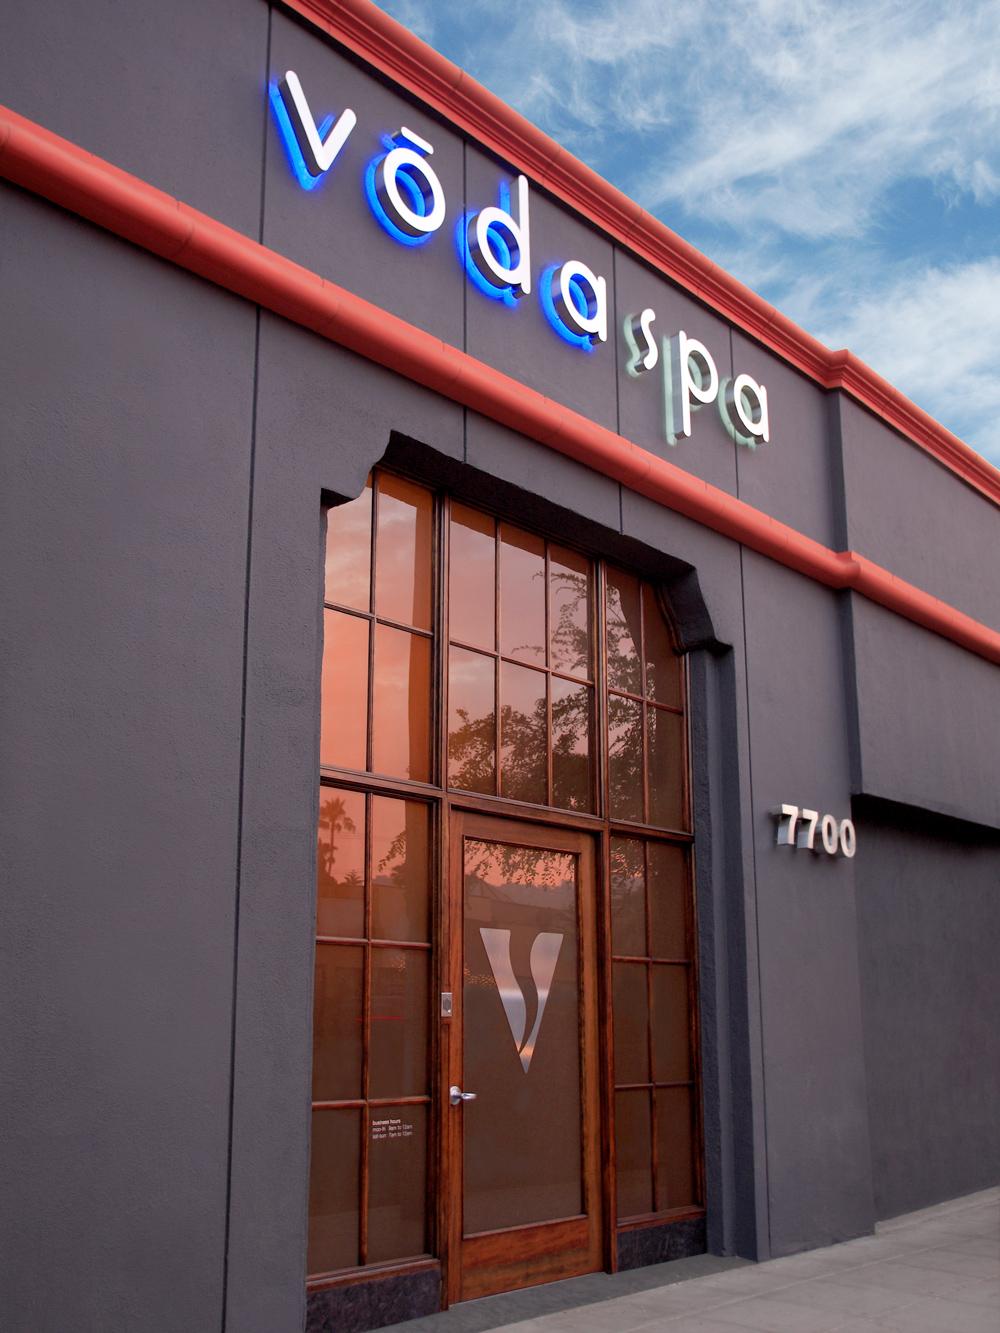 Voda Spa, West Hollywood (Los Angeles)